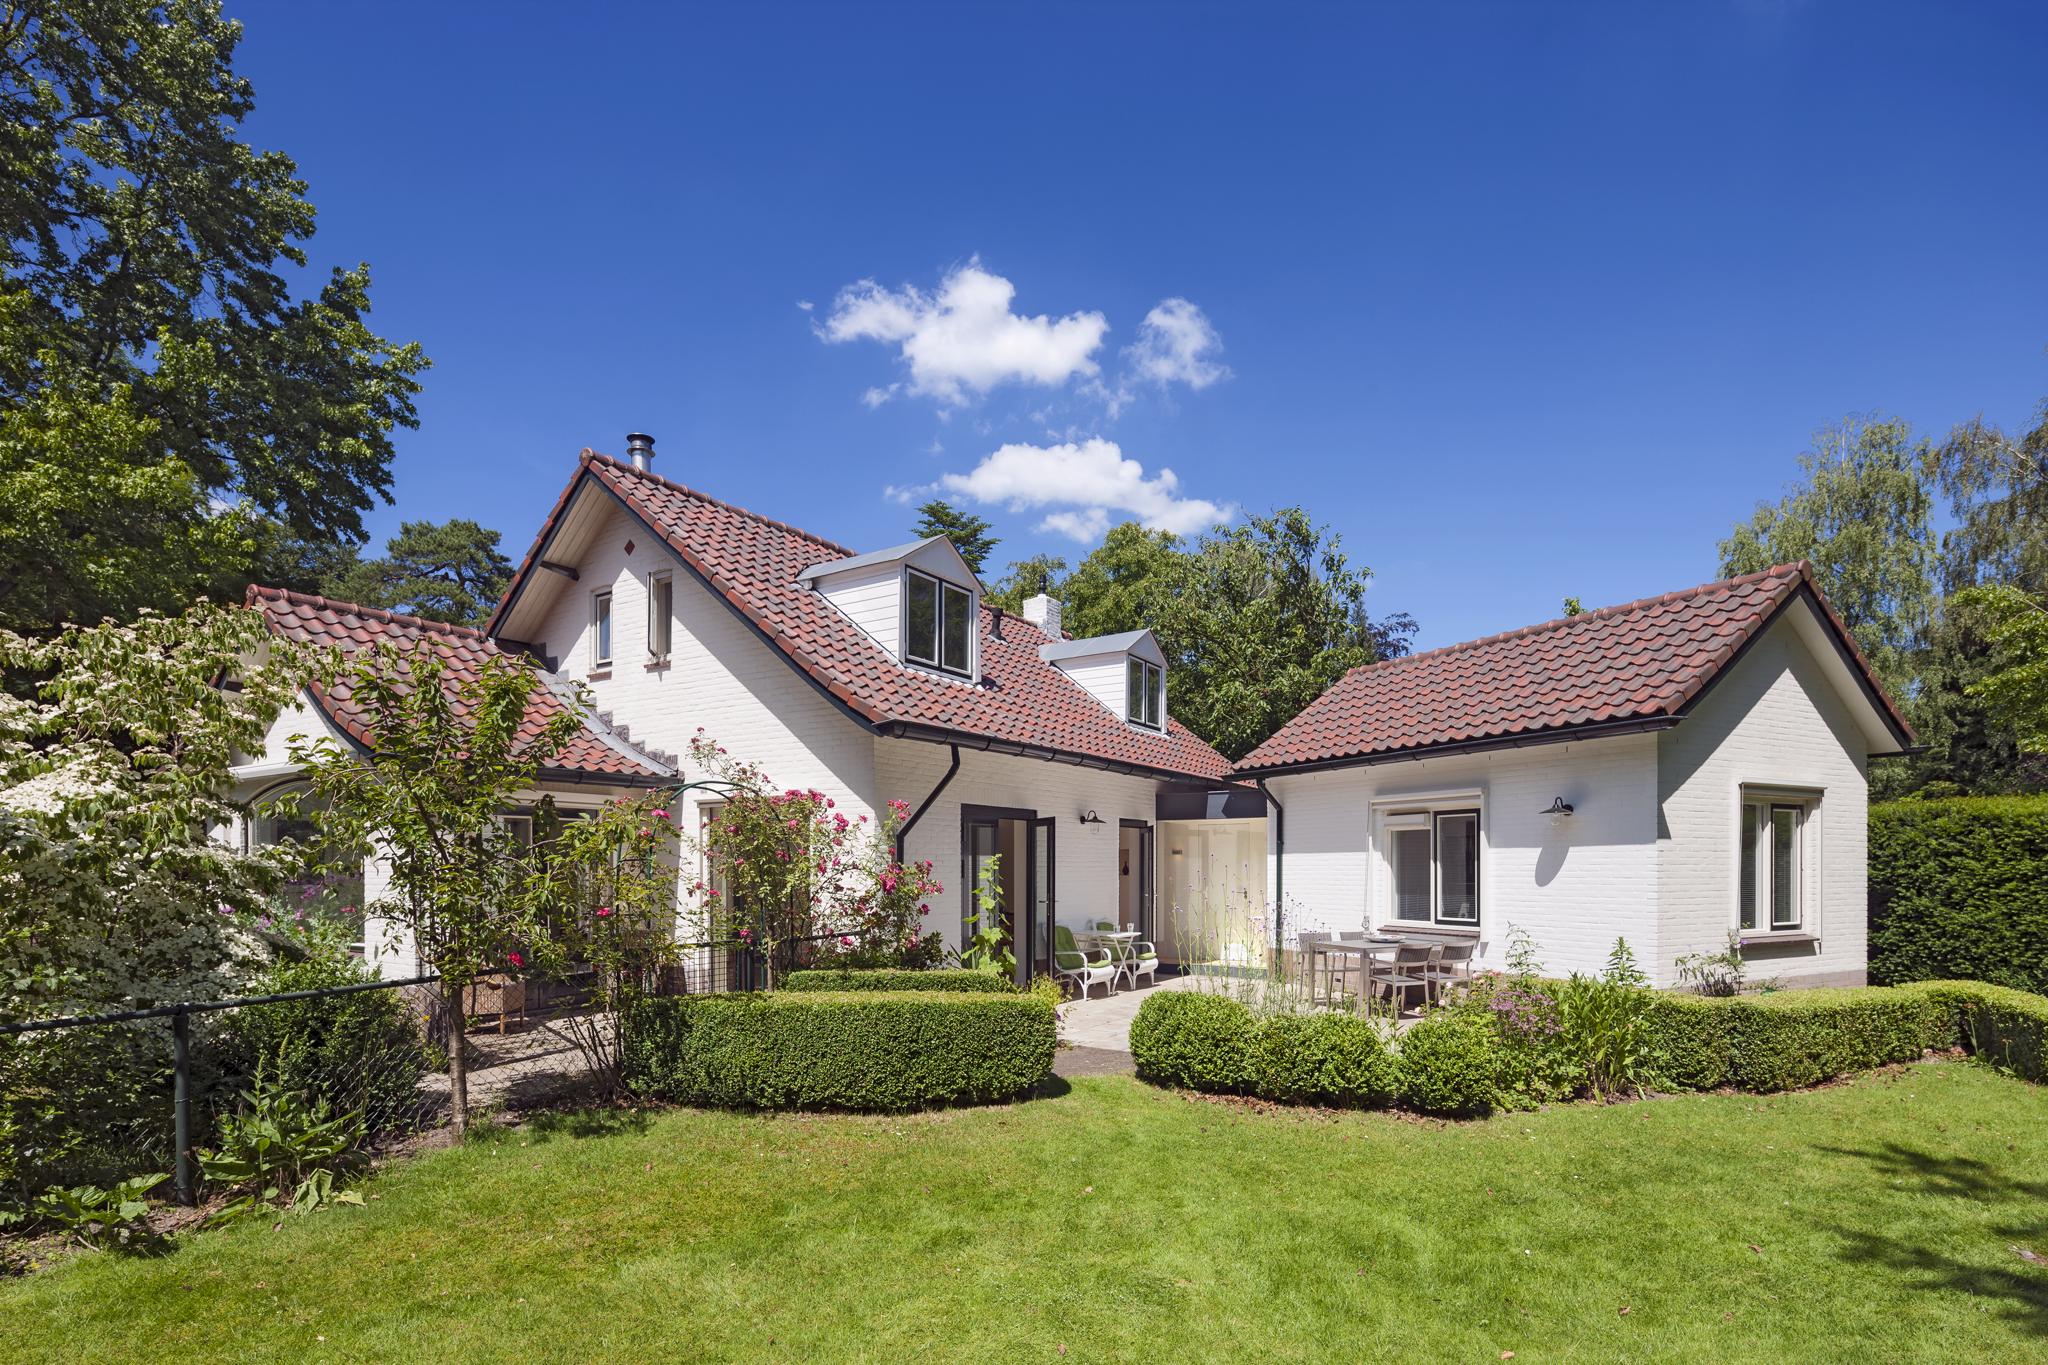 Tuinzijde woning Huis ter Heide